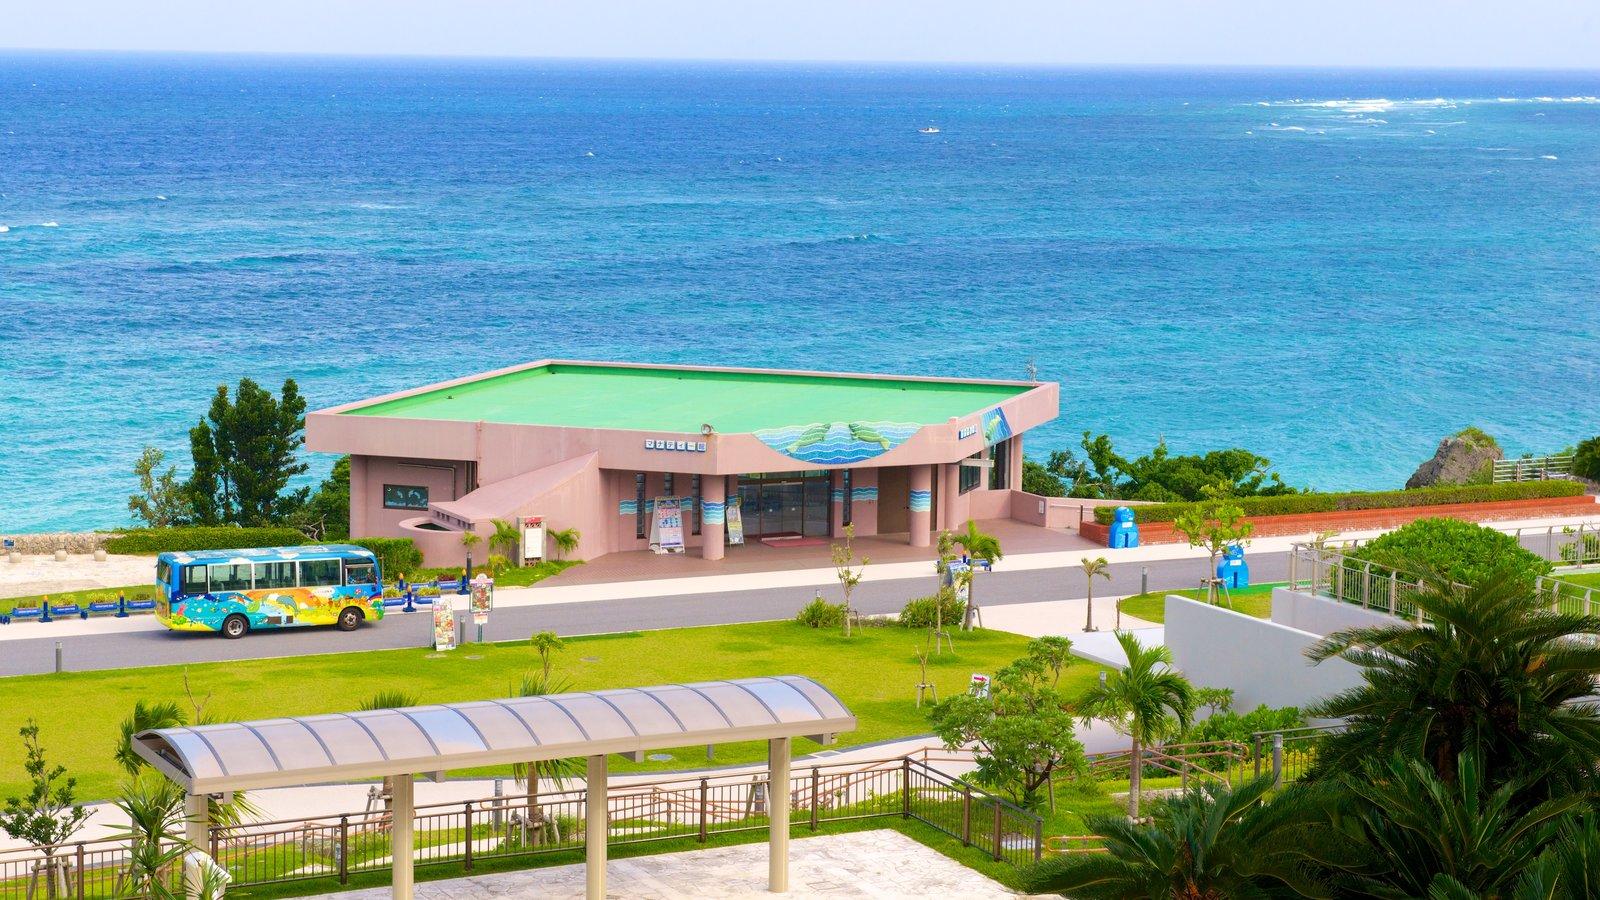 Okinawa Churaumi Aquarium which includes general coastal views